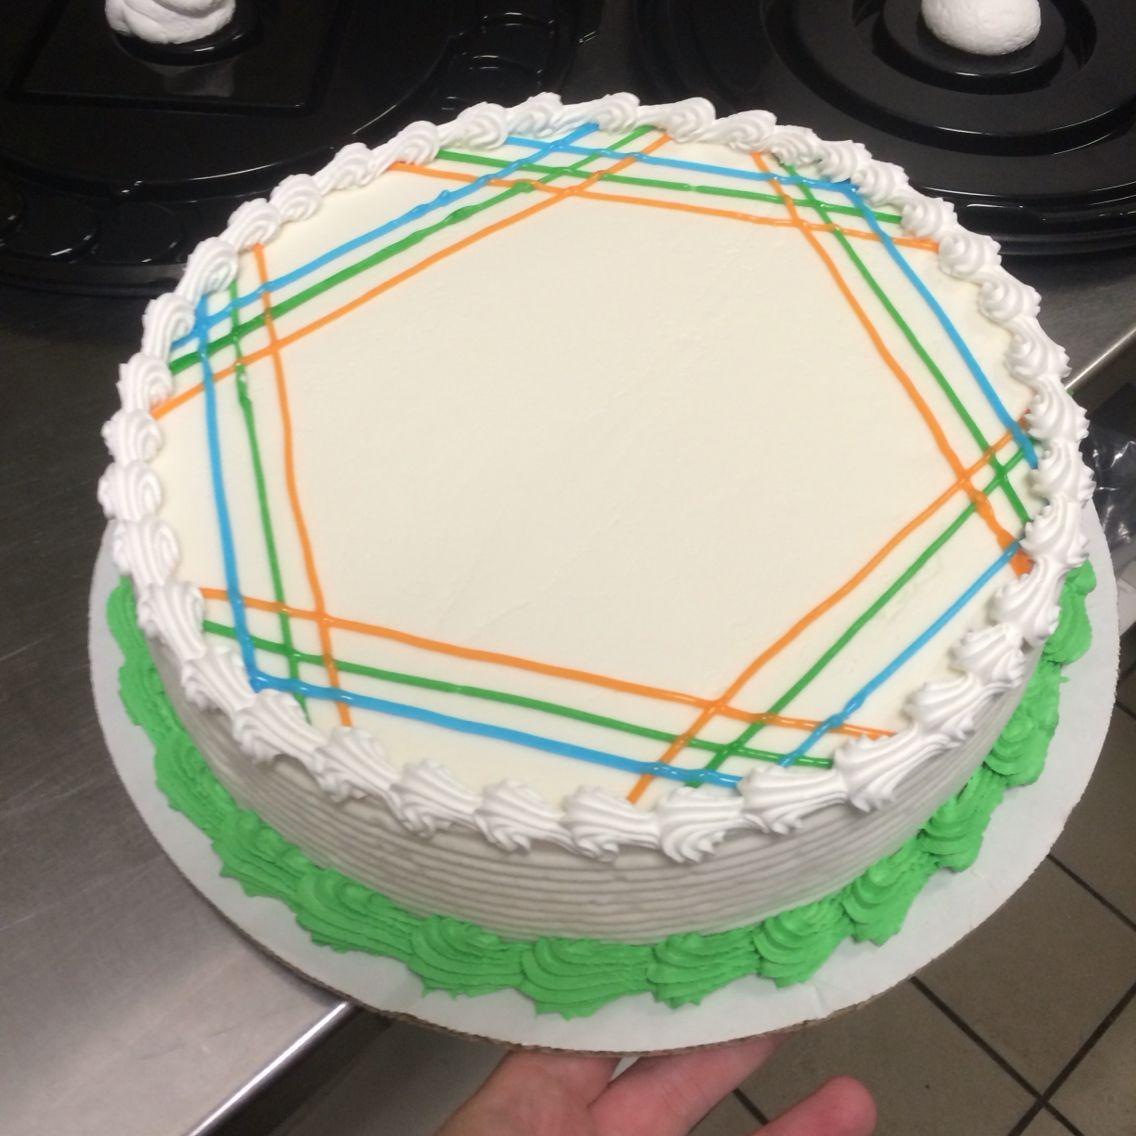 Dq Cake Design Hexagon Look Icecreamingredientsillustration With